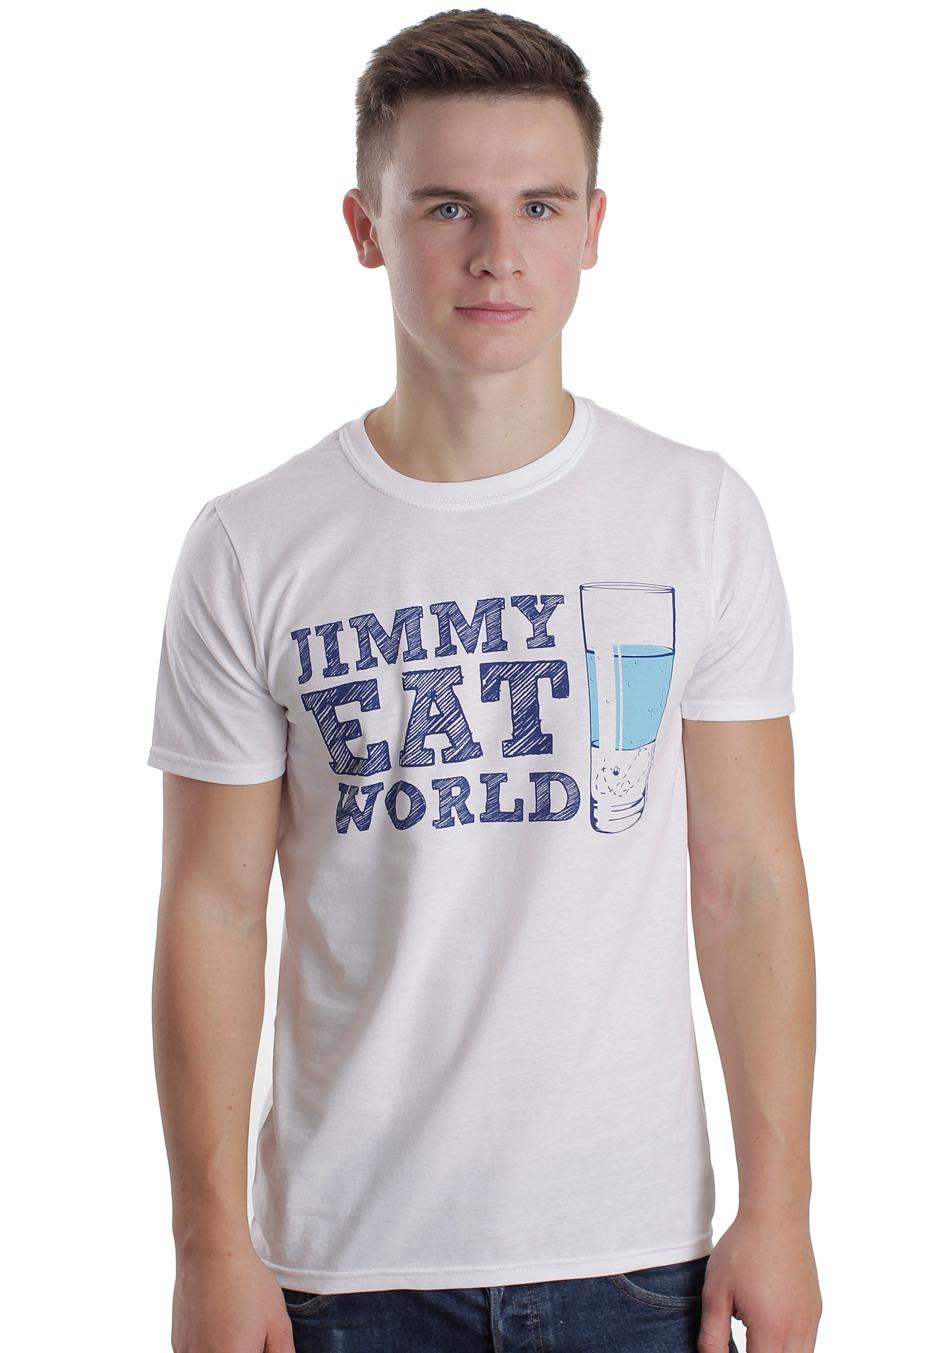 Jimmy Eat World  Tour Shirt